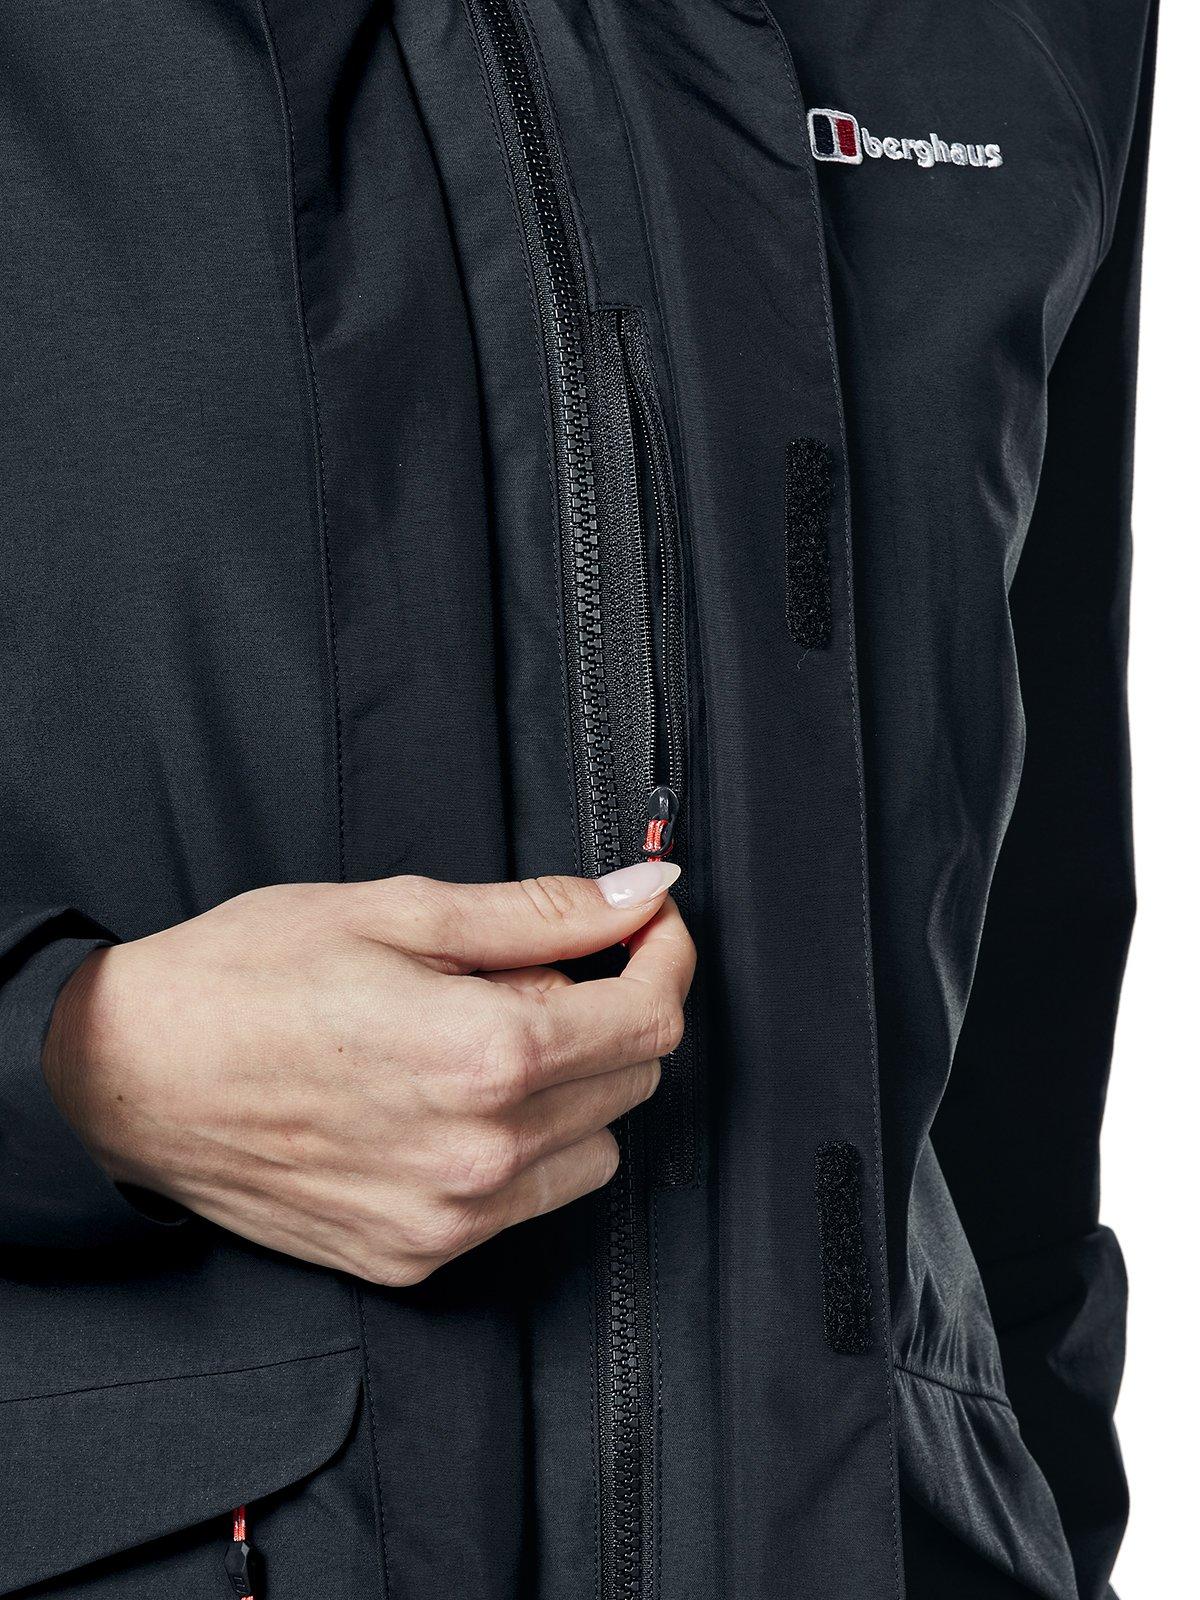 81ty %2BGY%2BXL - Berghaus Women's Hillmaster Gore-tex Waterproof Jacket